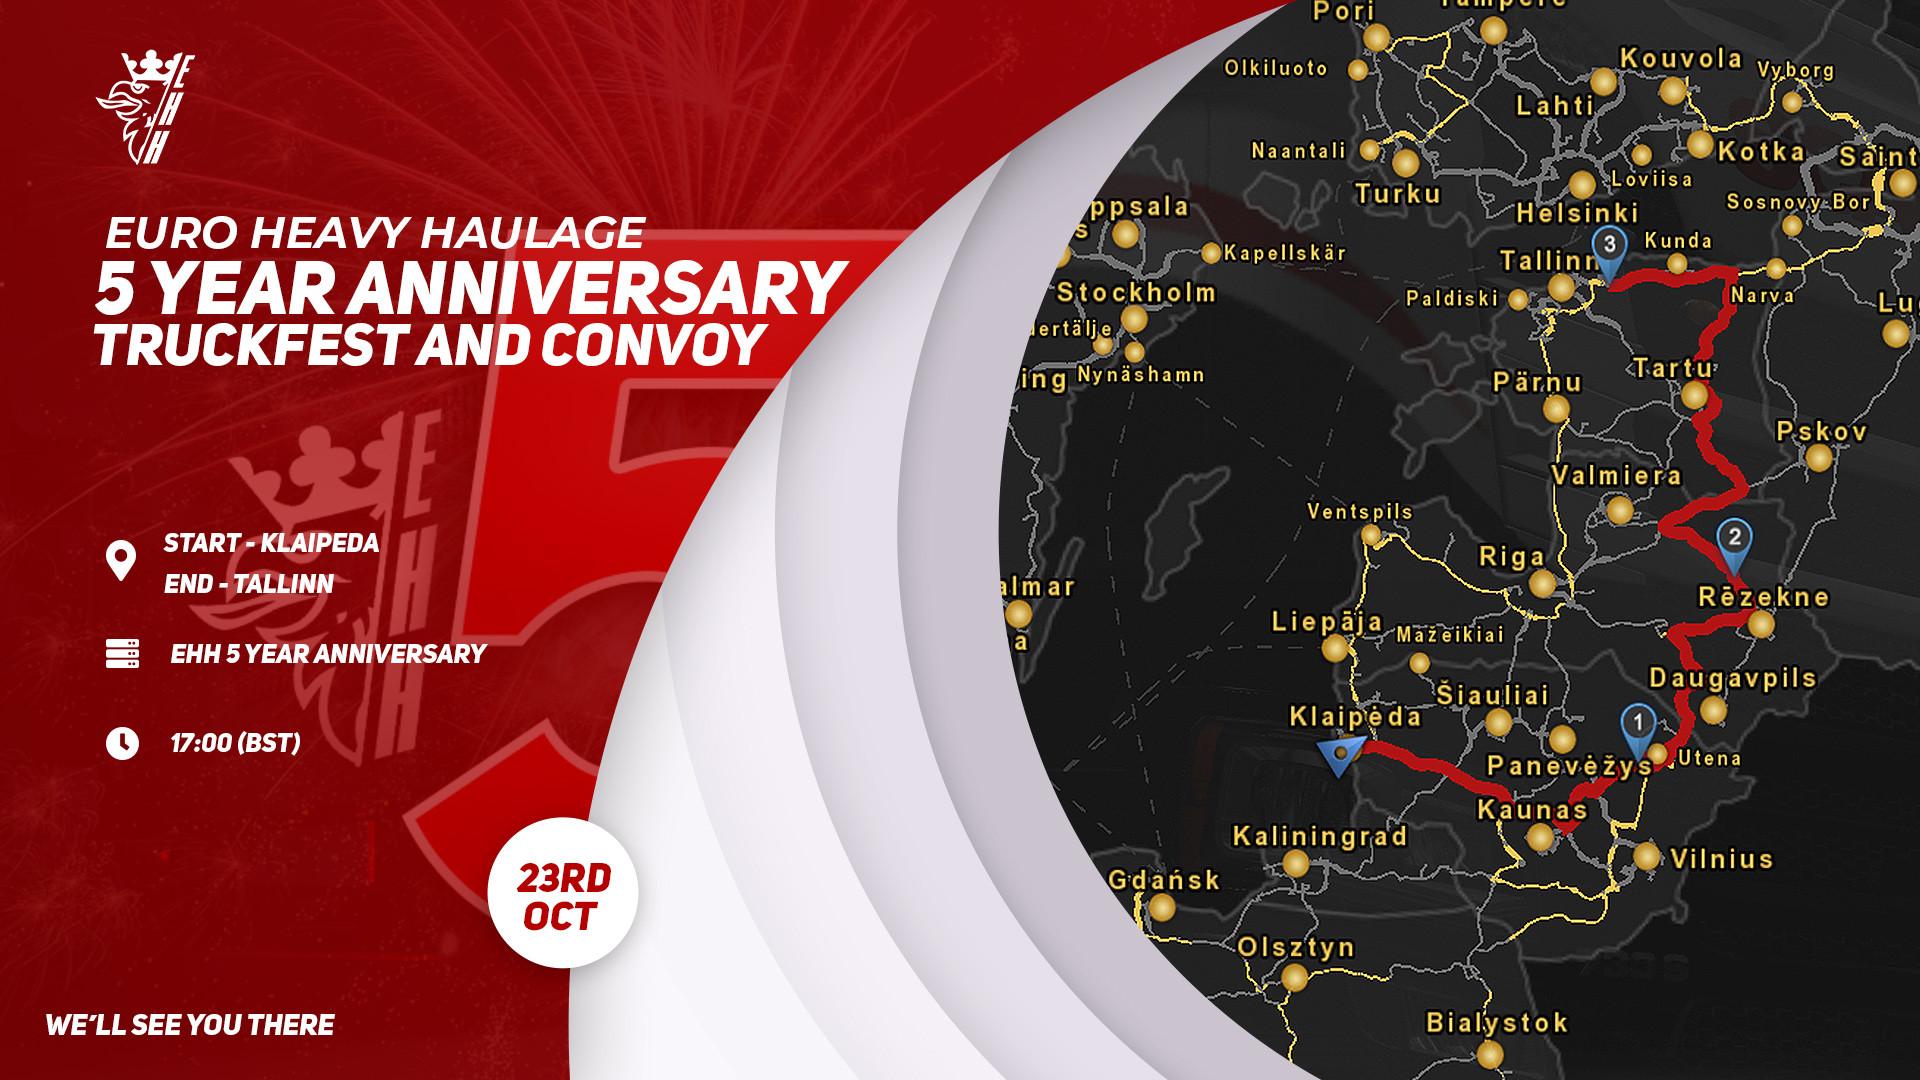 EHHVTC 5 Year Anniversary Route Map